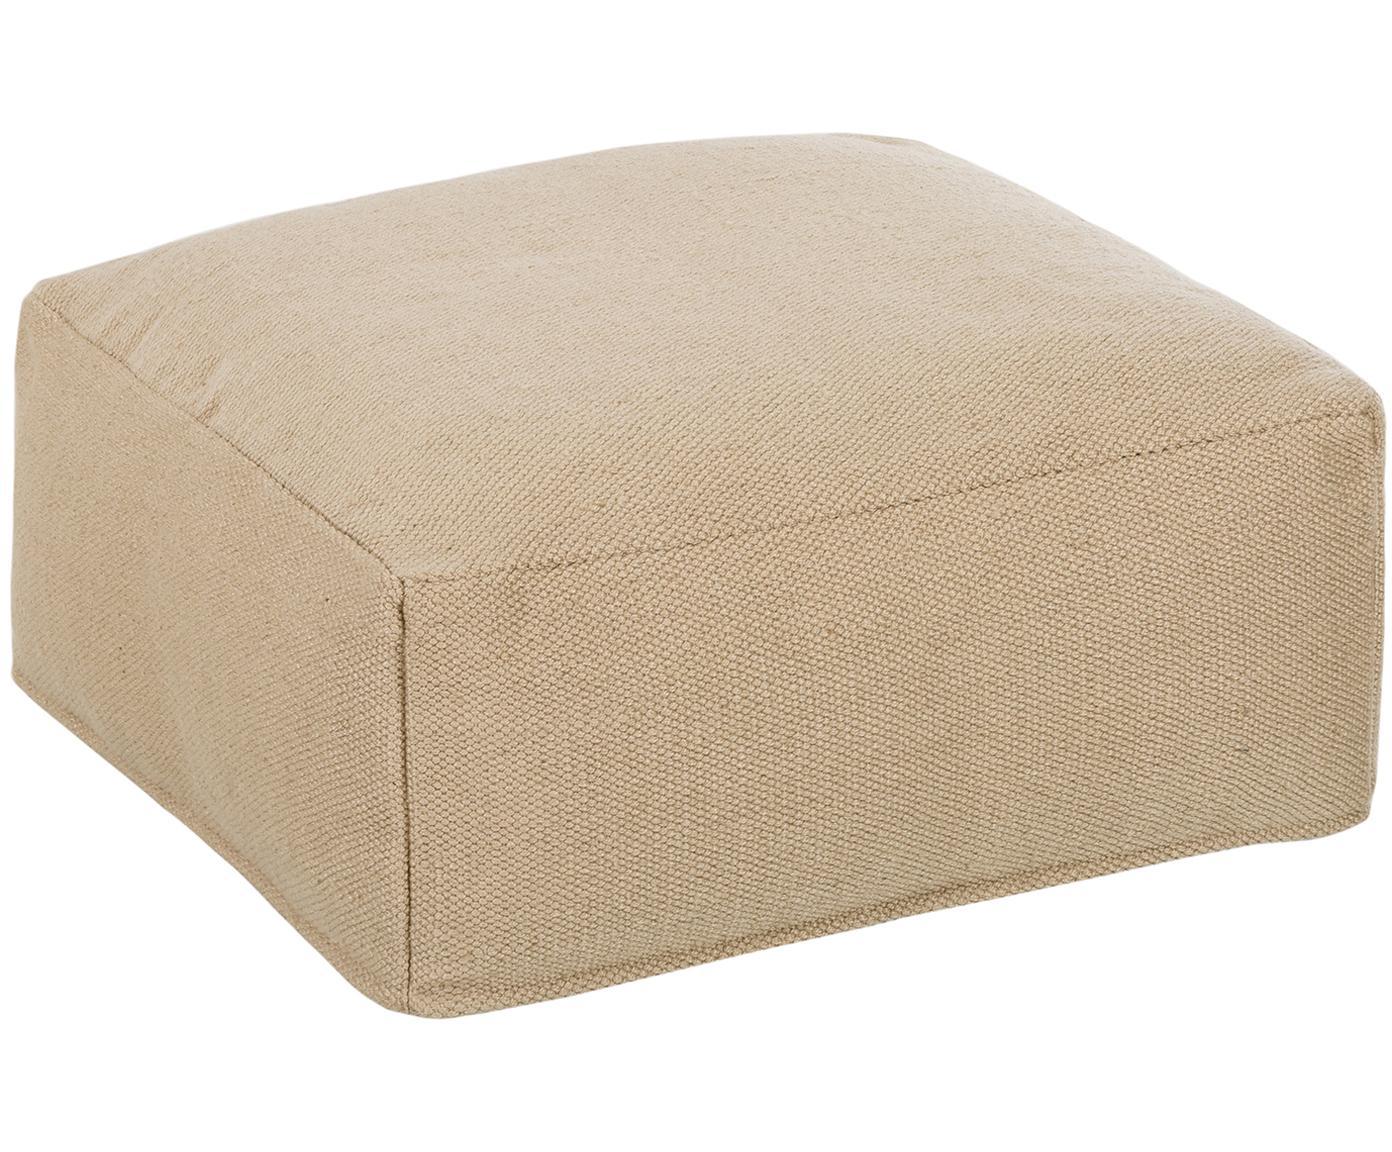 Cuscino da pavimento da interno-esterno Khela, Rivestimento: poliestere riciclato, Beige, Larg. 60 x Alt. 25 cm